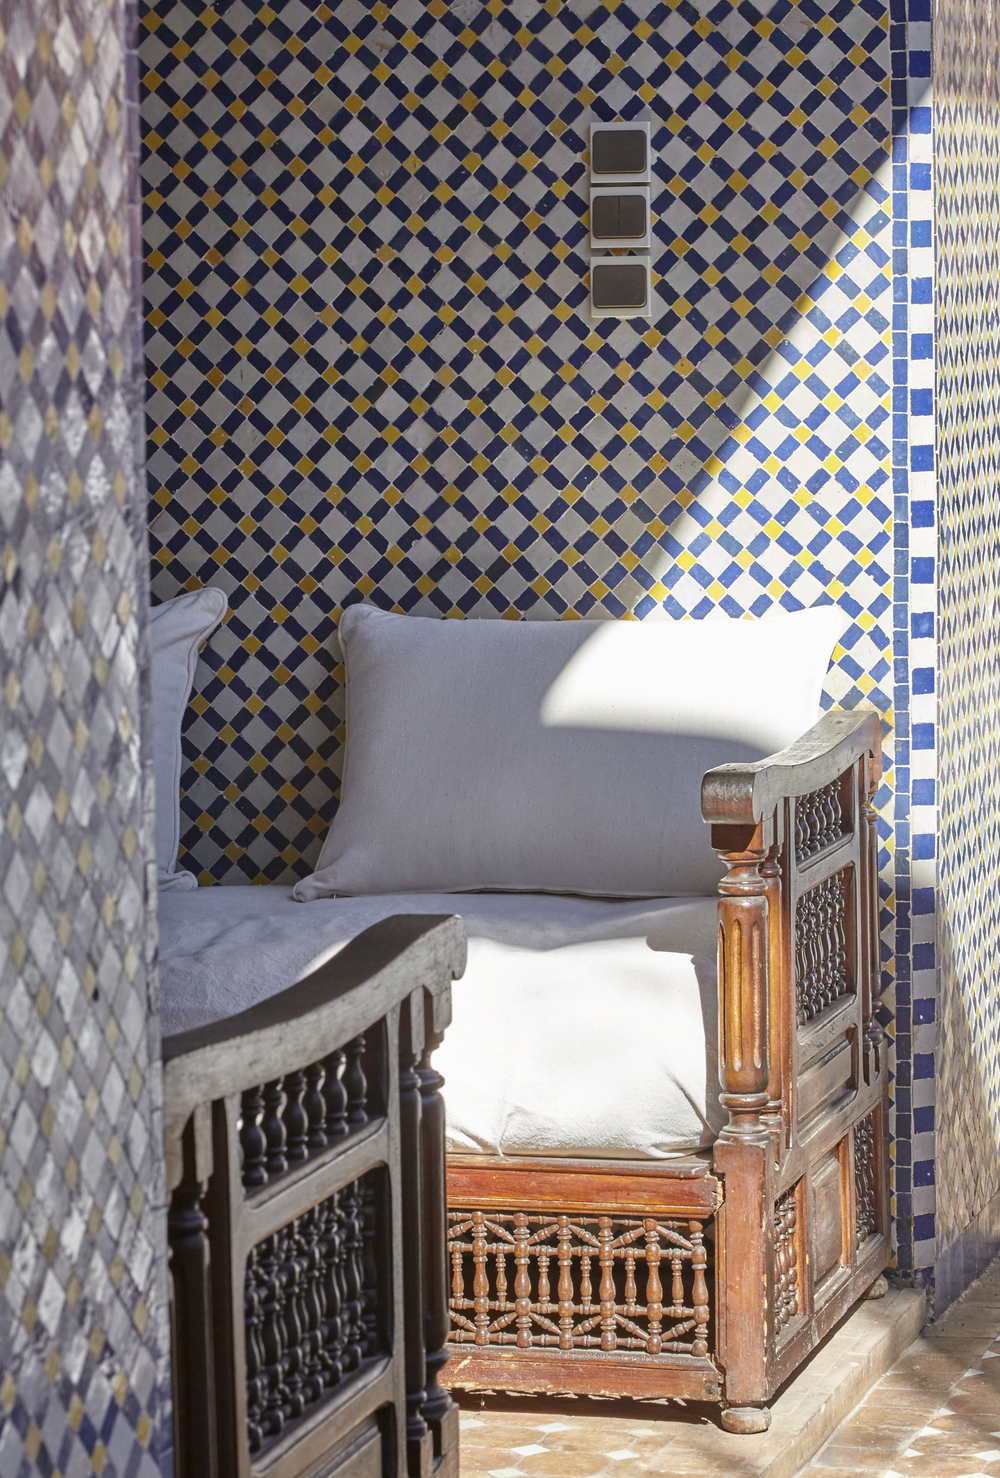 Copy of salon et zelliges riad jardin secret marrakech maroc